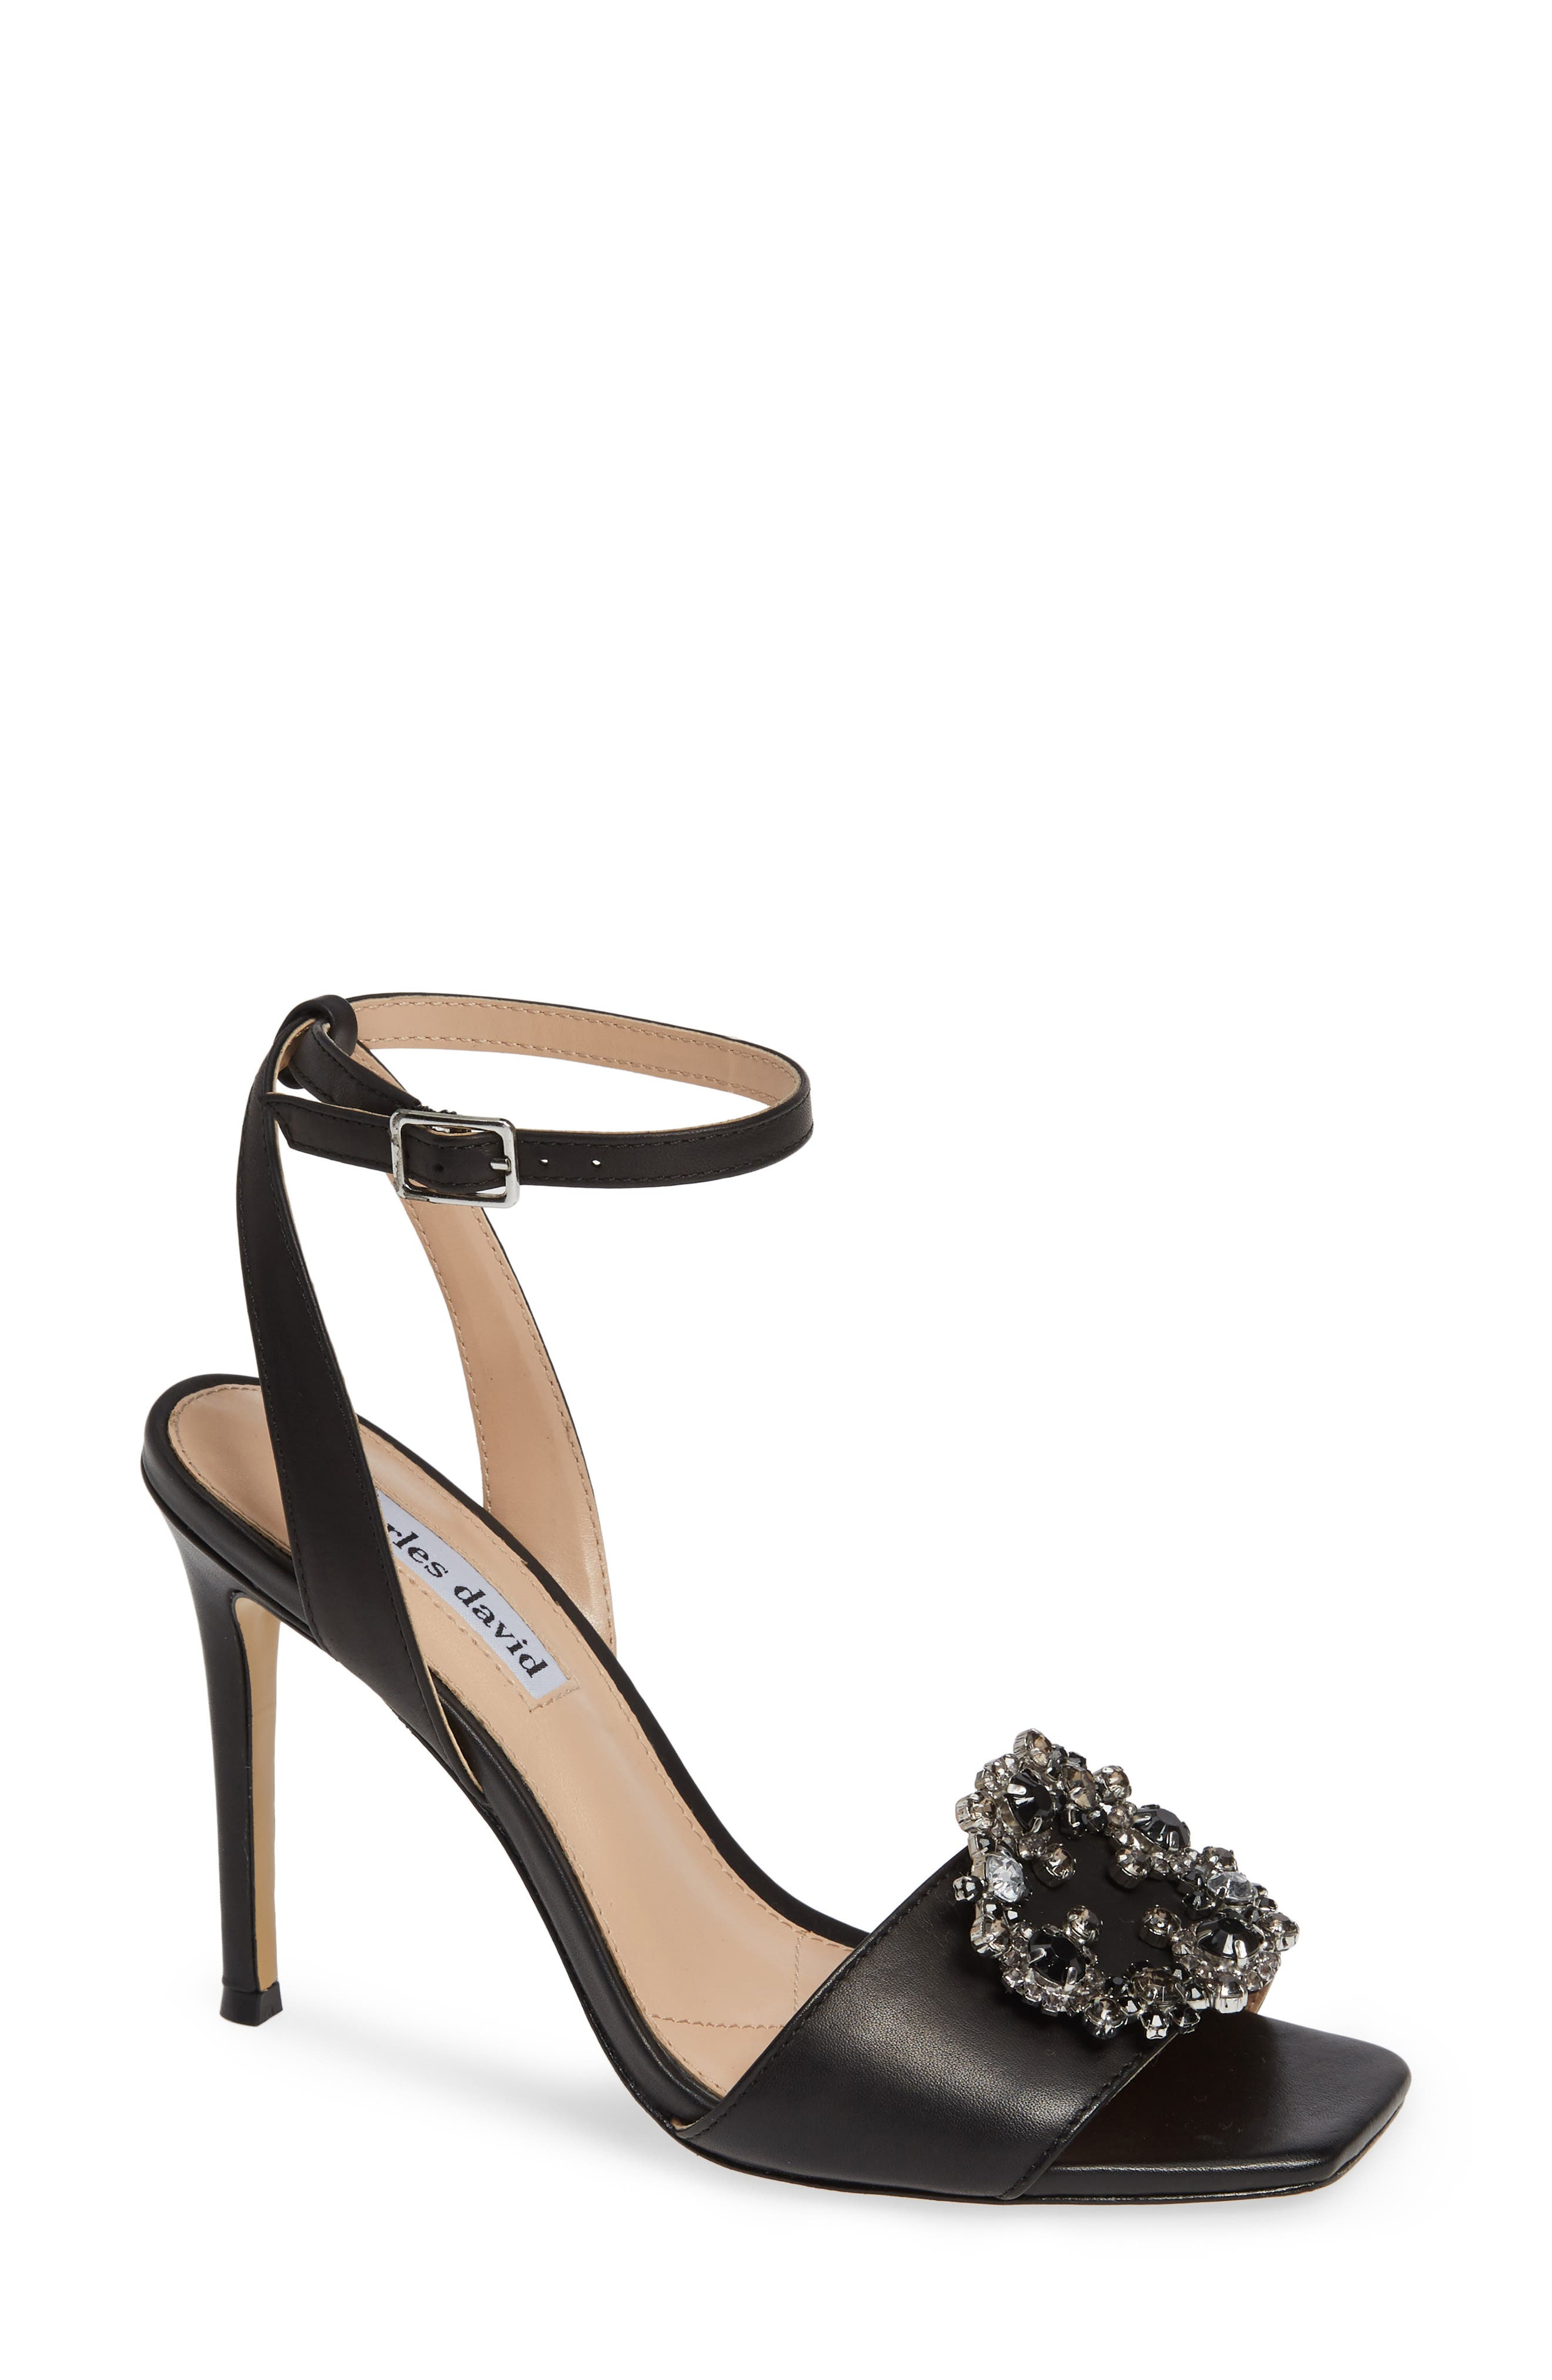 124b0690e50 Buy charles david shoes for women - Best women's charles david shoes ...